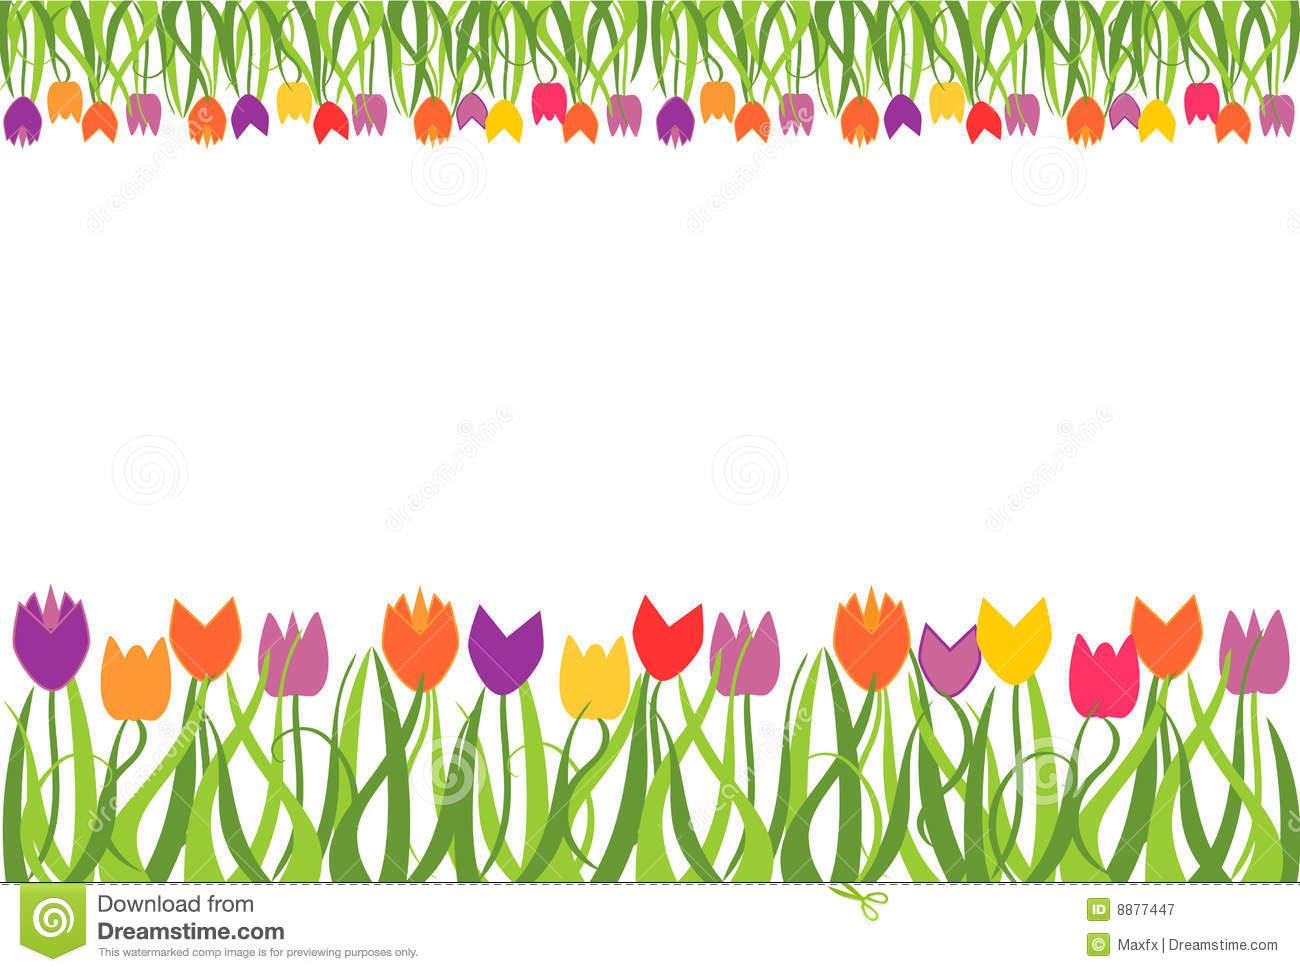 Divider clipart tulip. Tulips border portal